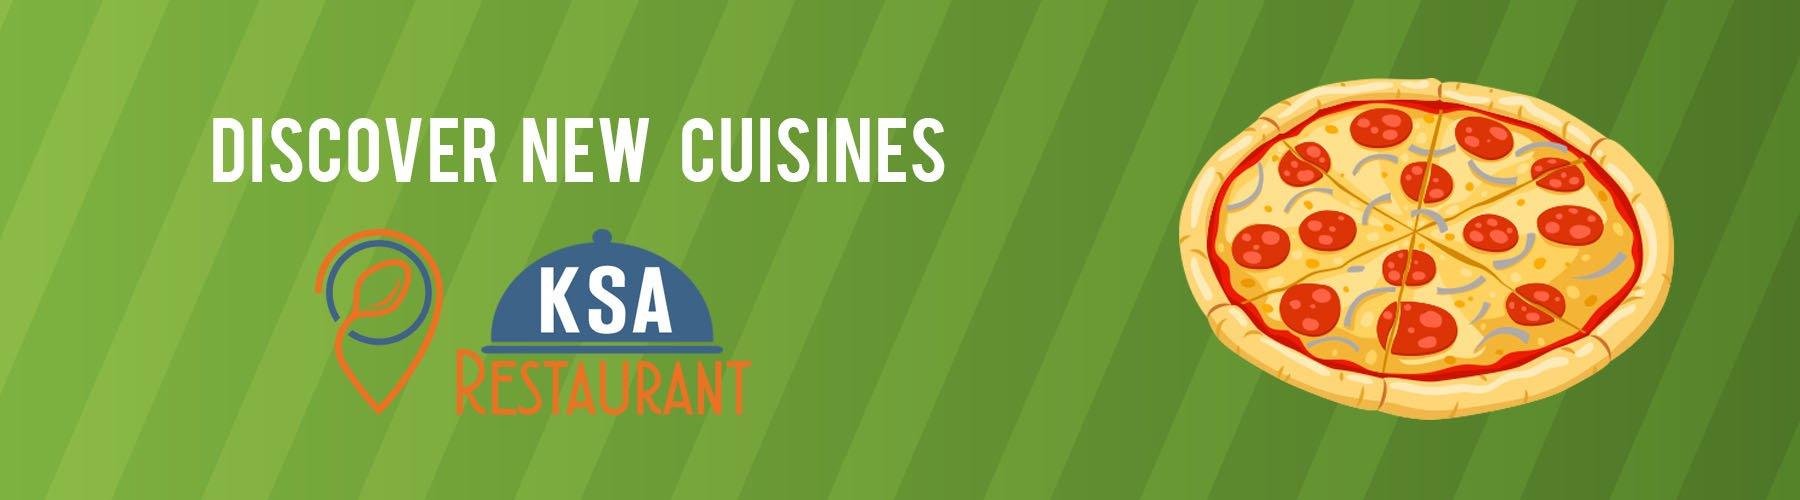 Discover new cuisines in Saudi Arabia.